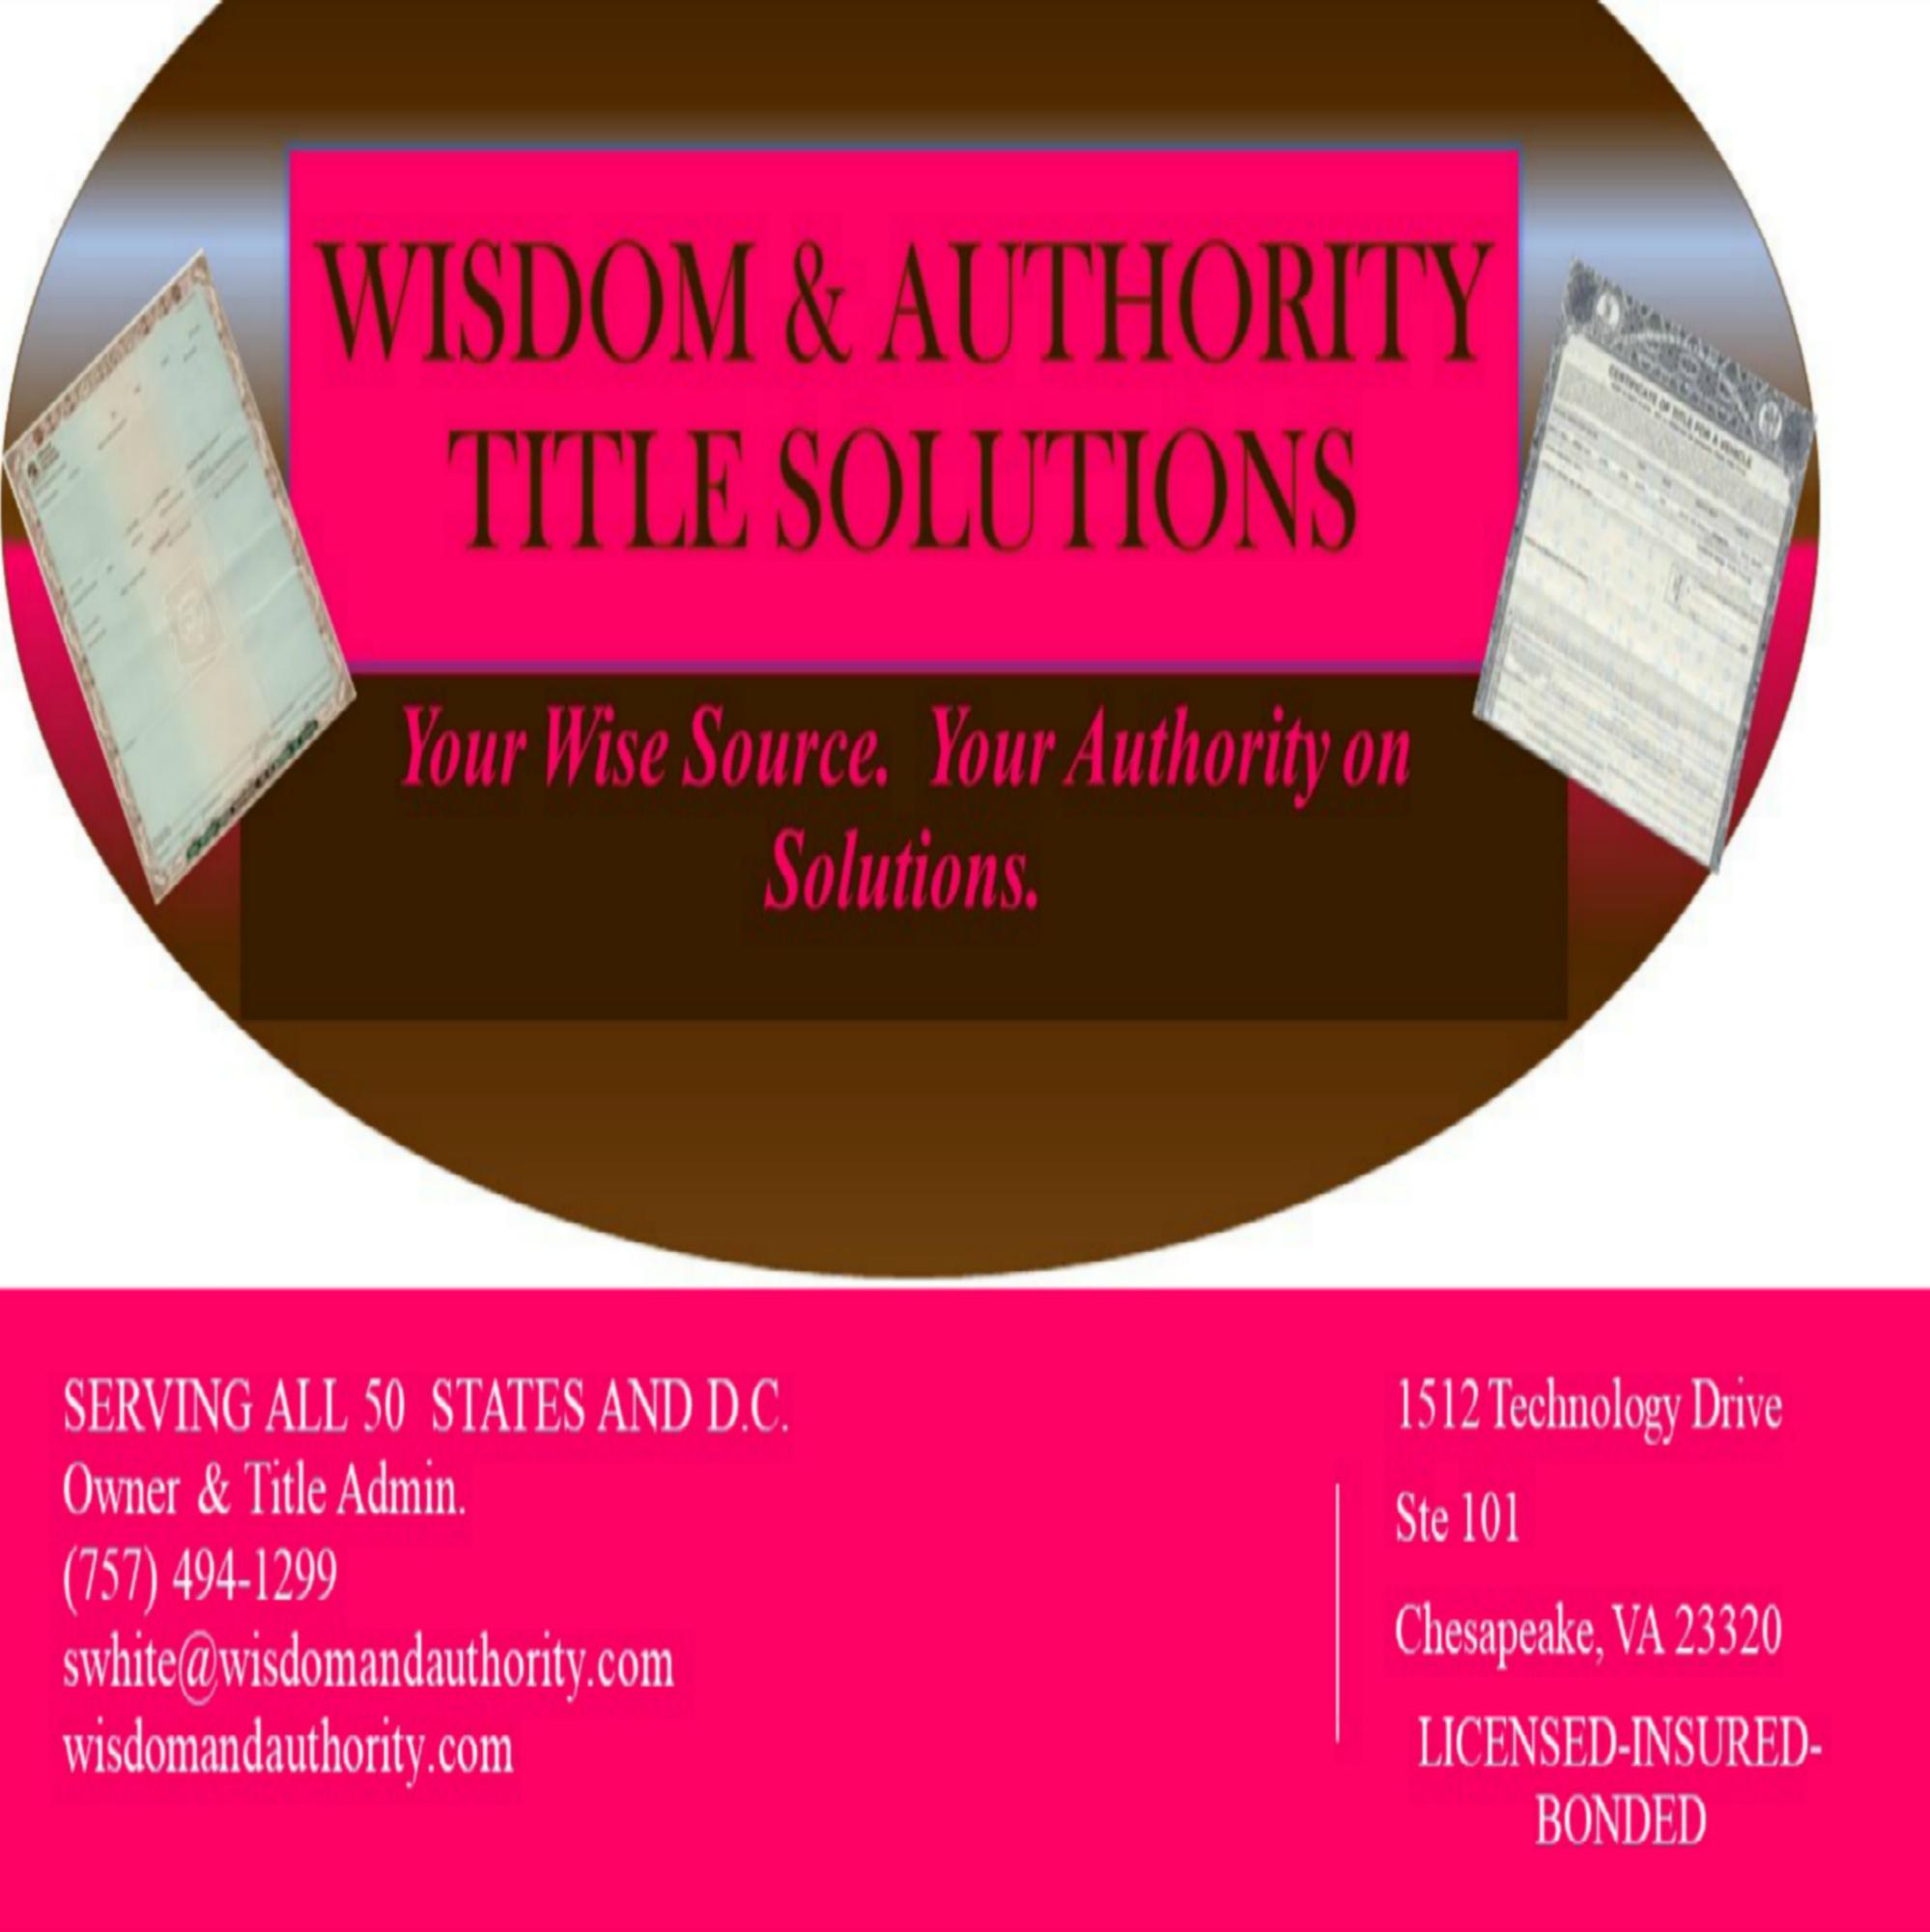 Wisdom & Authority Title Solutions LLC